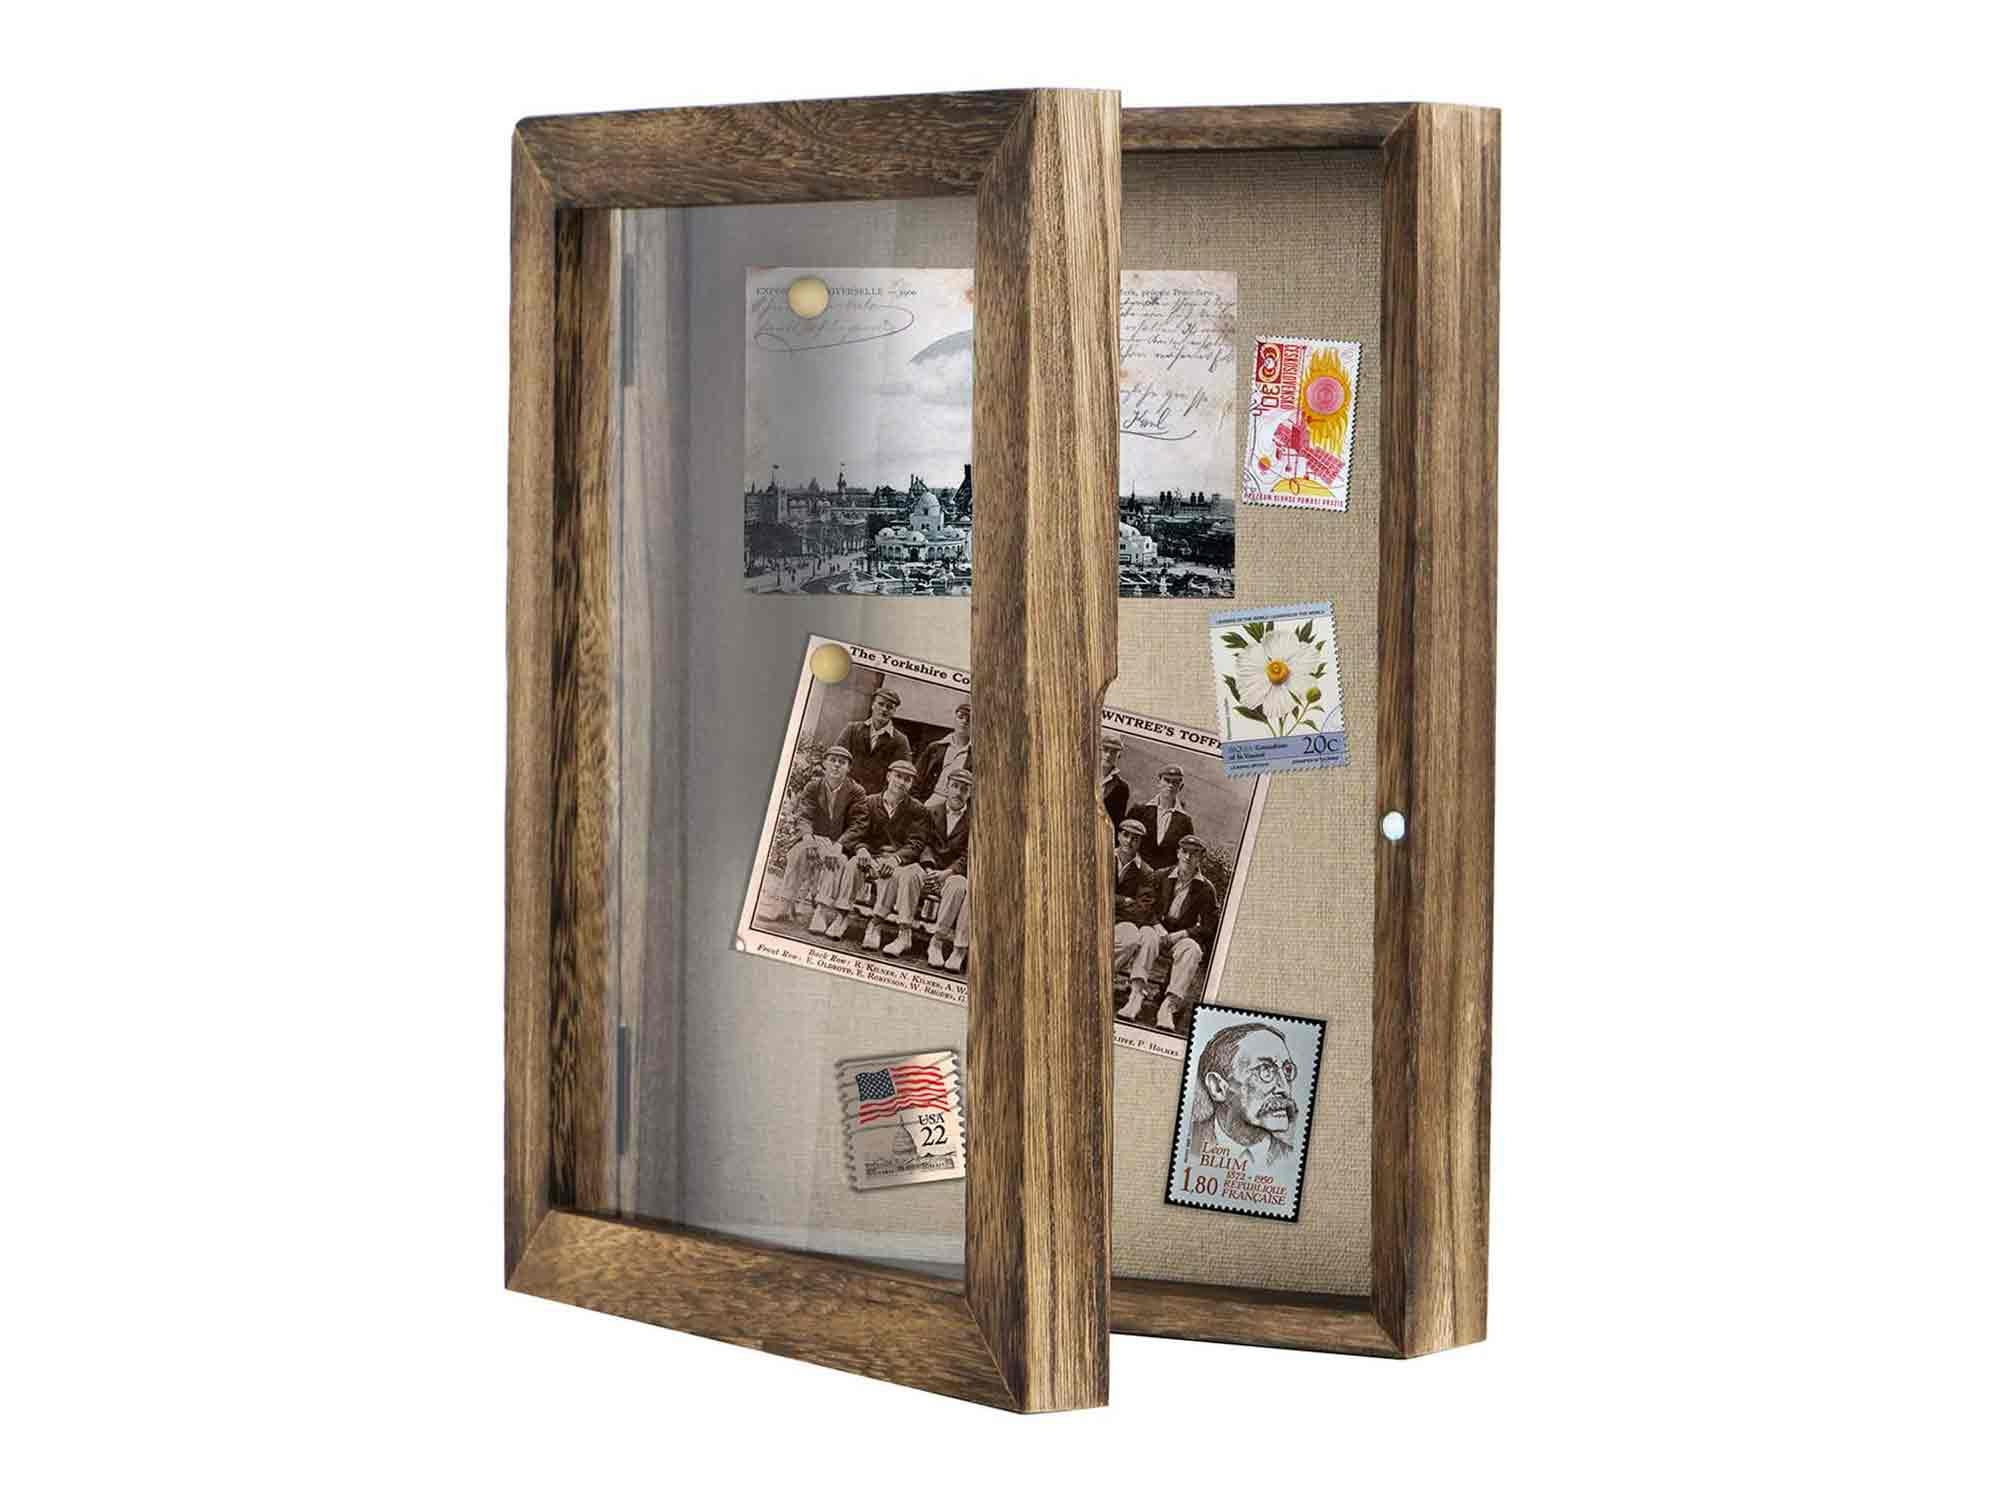 Love-KANKEI Shadow Box Frame 8x10 Shadow Box Display Case with Linen Back Memorabilia Awards Medals Photos Memory Box Carbonized Black/Brown